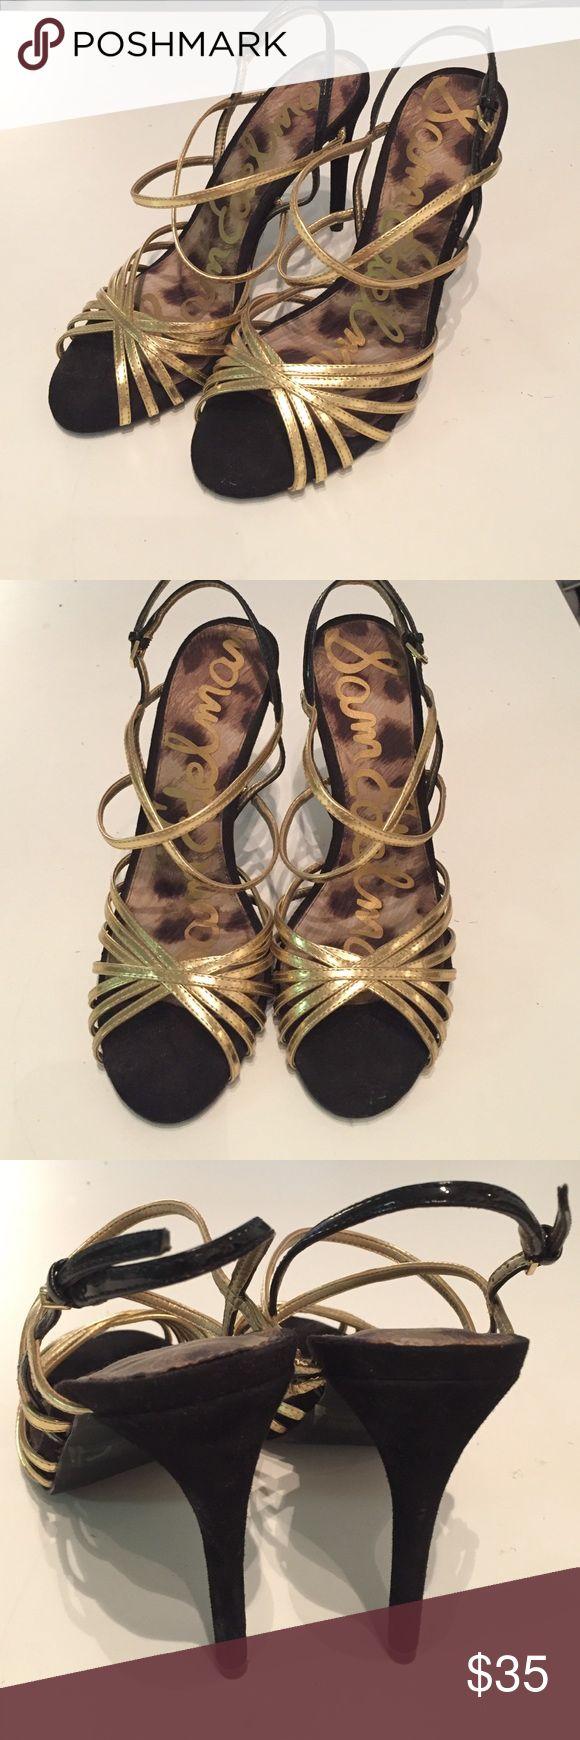 Sam Edelman heels Great condition. Worn a few times. Sam Edelman Shoes Heels